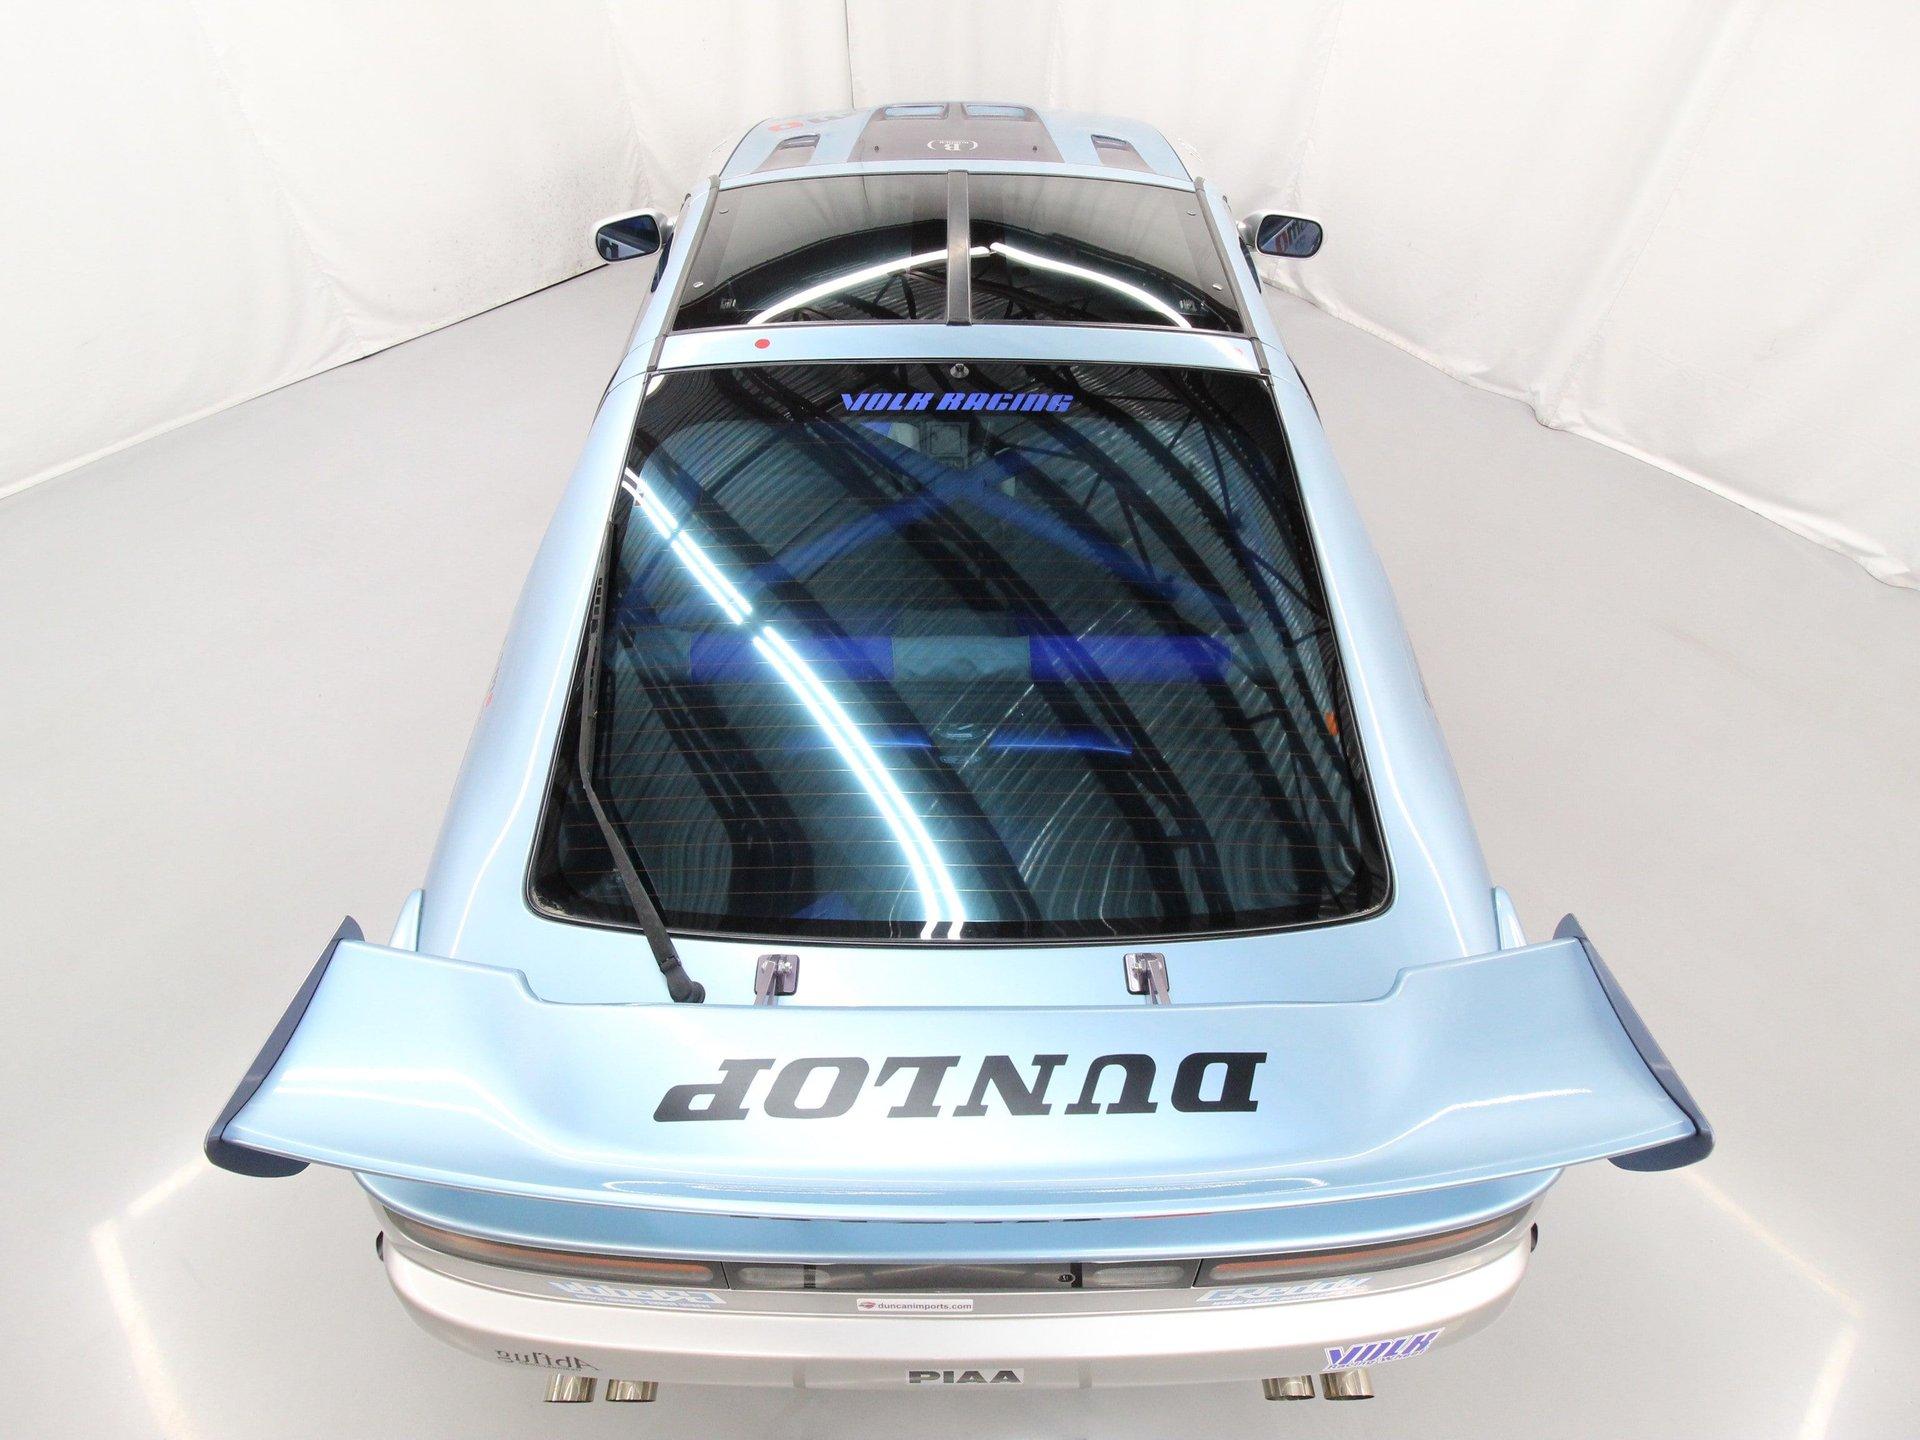 1991 Nissan Fairlady 300ZX